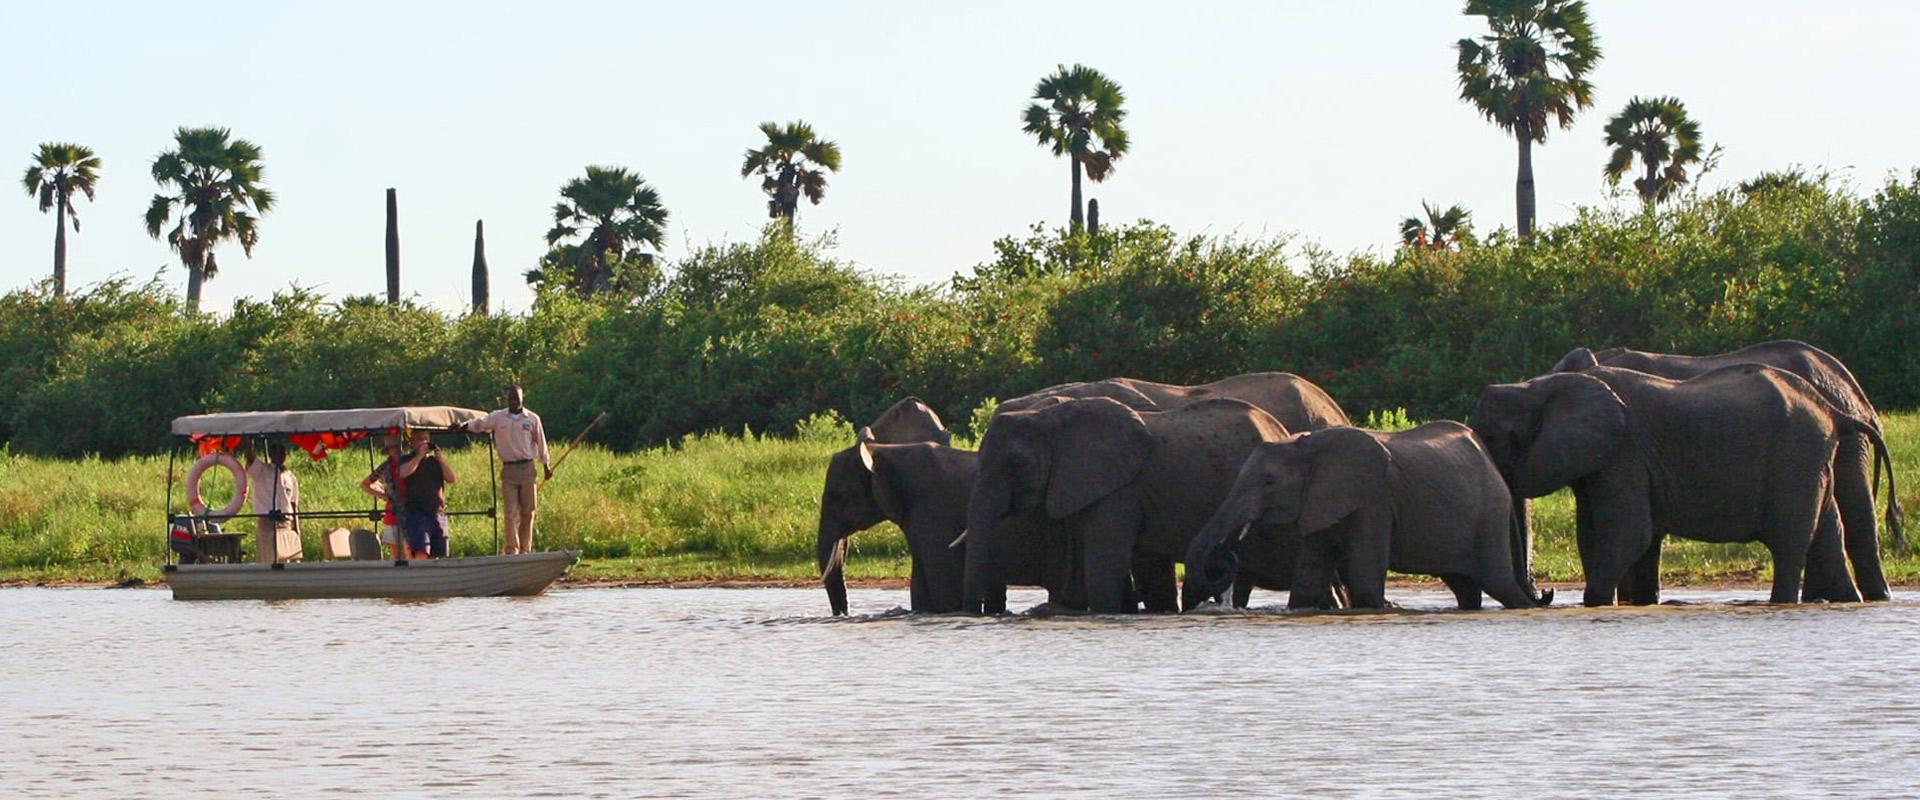 5 Days Tanzania Safari to Nyerere National Park and Kilwa